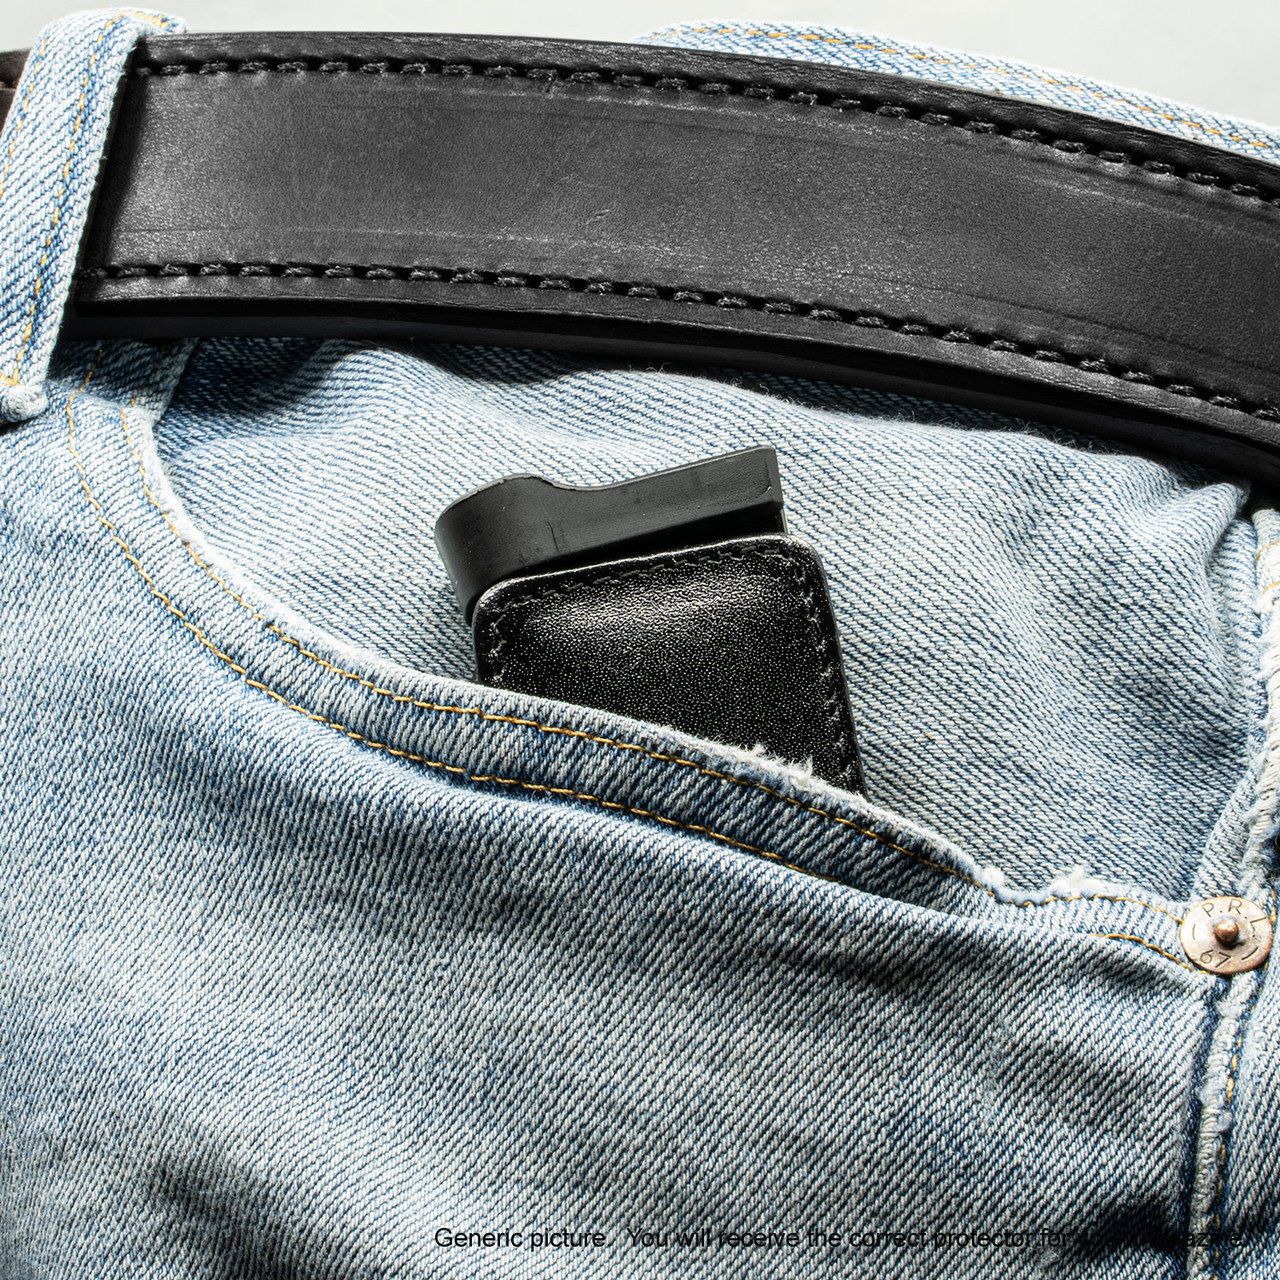 Glock 19X Black Leather Magazine Pocket Protector